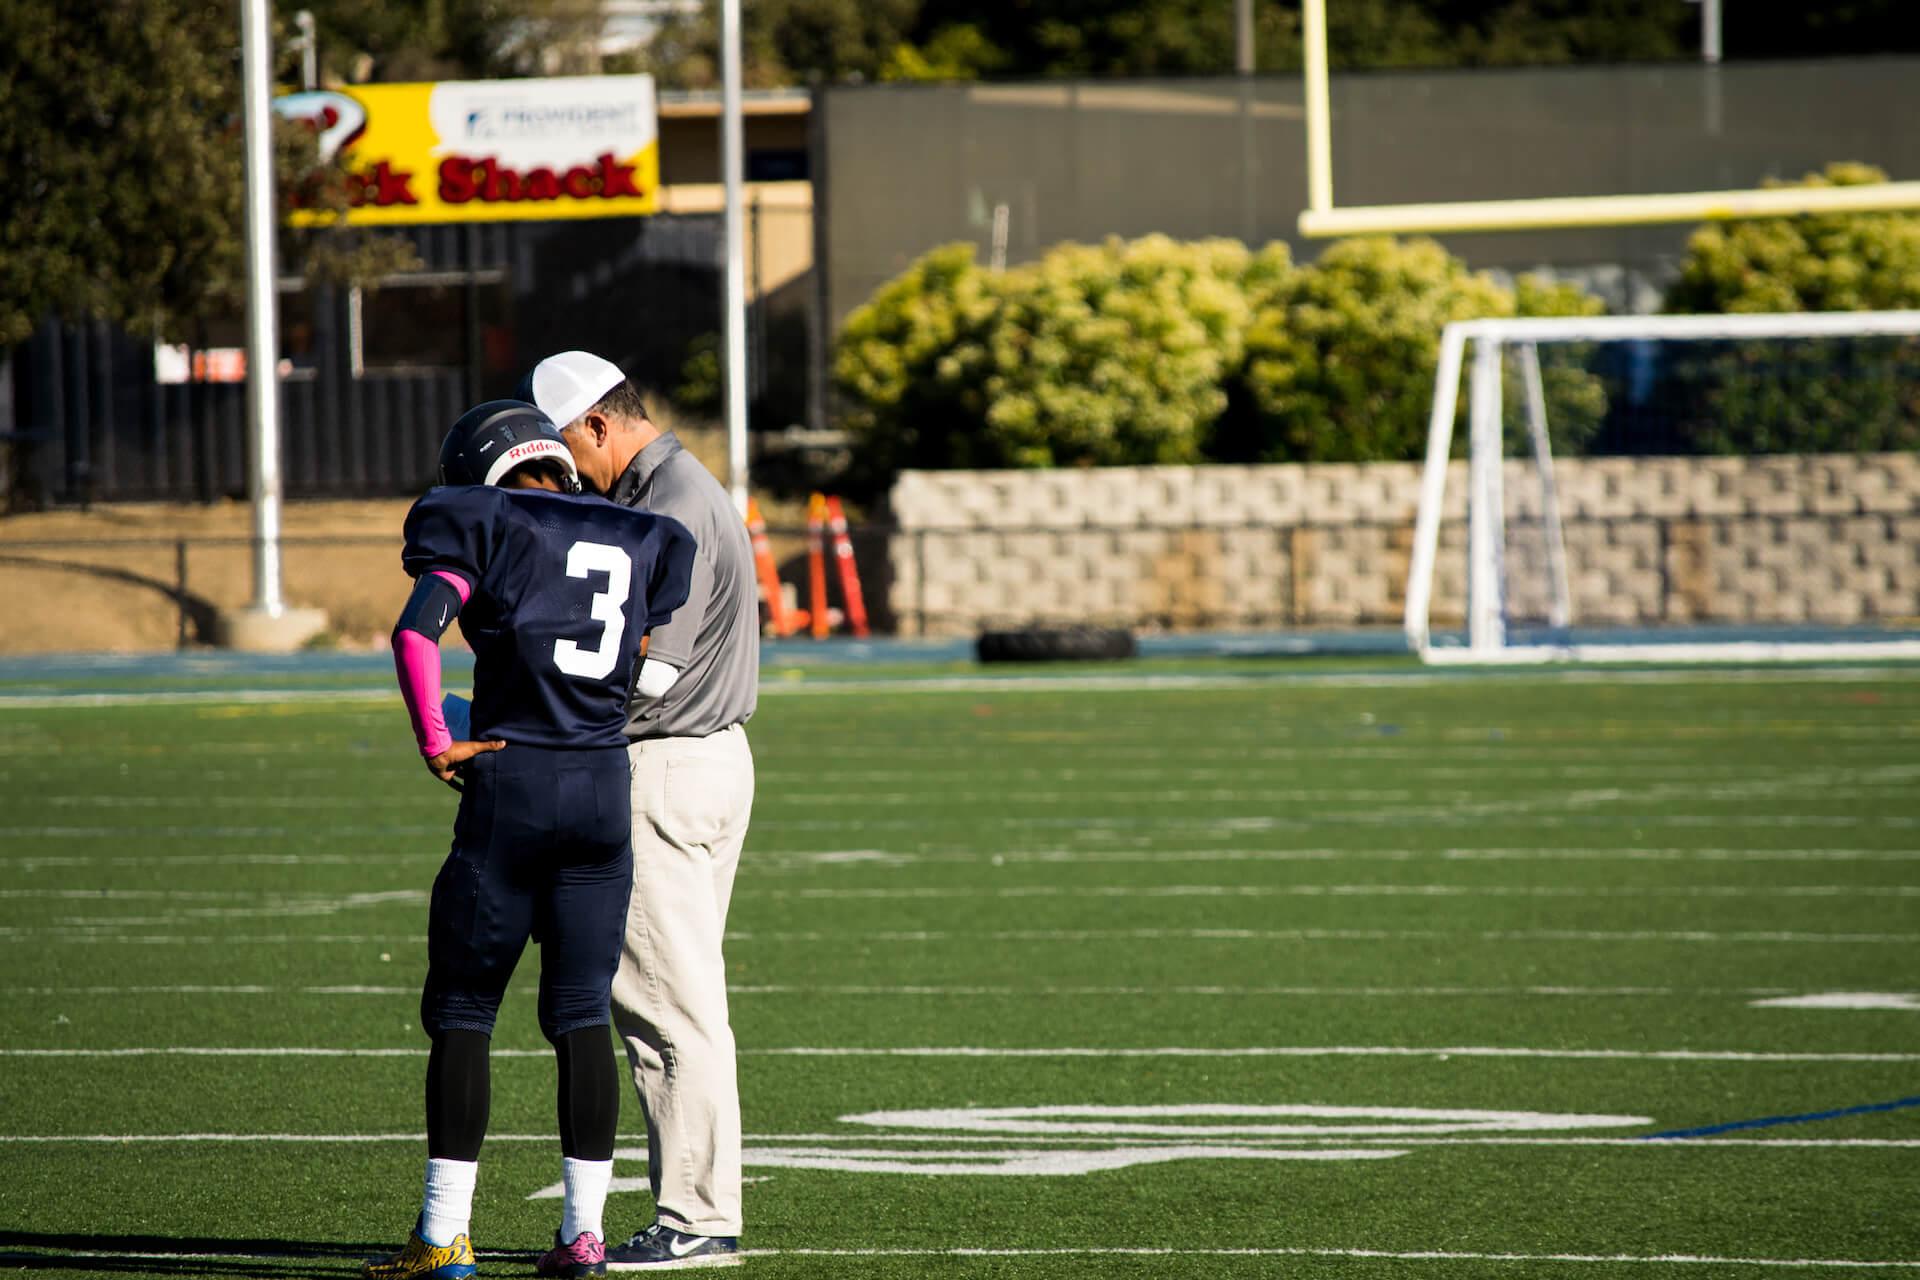 Quarterback, Simon Tara, discusses the game plan with coach, Bruce Douglas during a timeout.